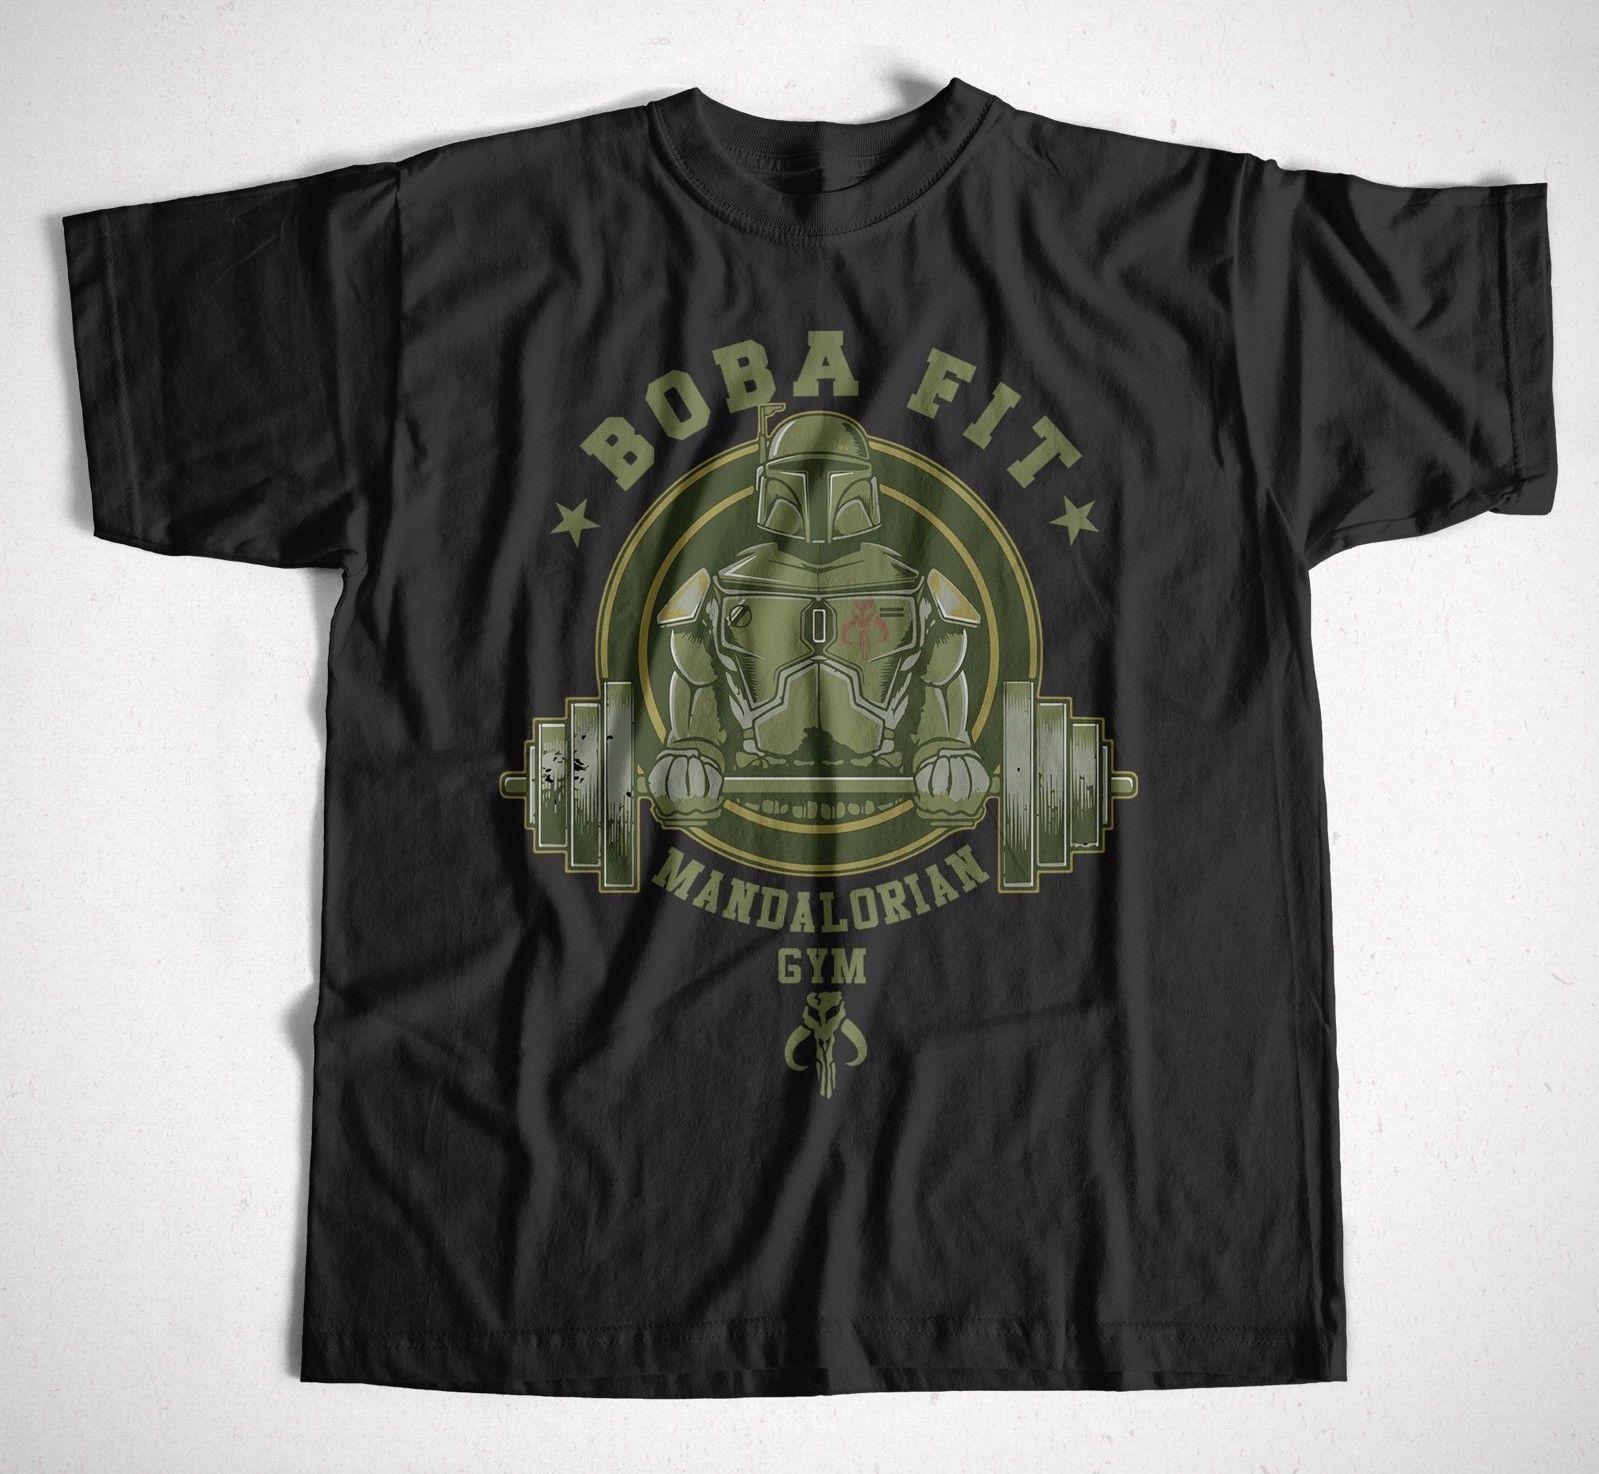 T-Shirt Boba Fit Fett Mandalorianer Schwarz Star Wars Spaß, Kult, Jedi, stormtrooper Druck T Männer Kurzarm Kleidung freies verschiffen